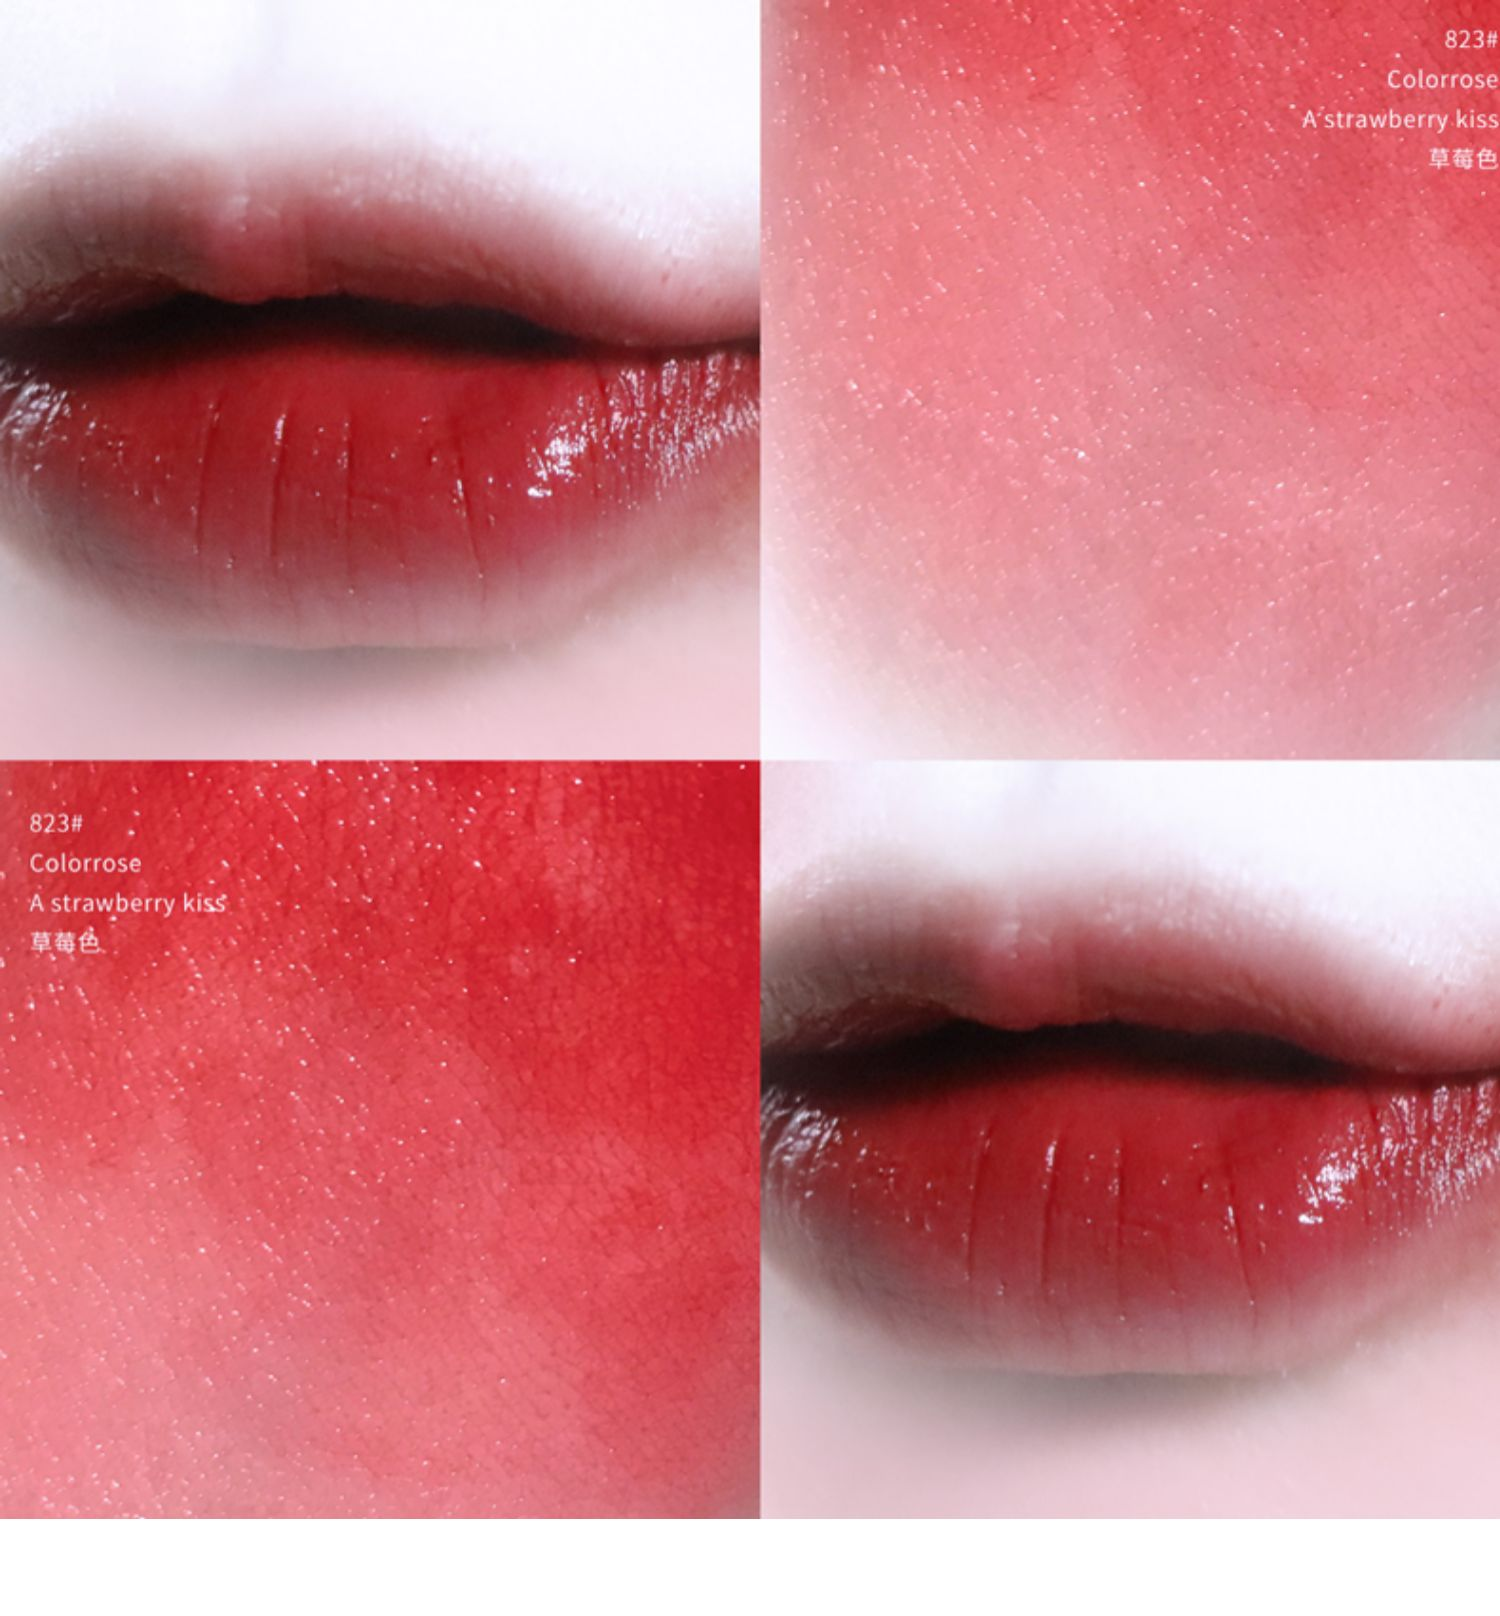 colorrose/口红女学生款正品名牌英国口红小众品牌烂番茄色牛血色商品详情图